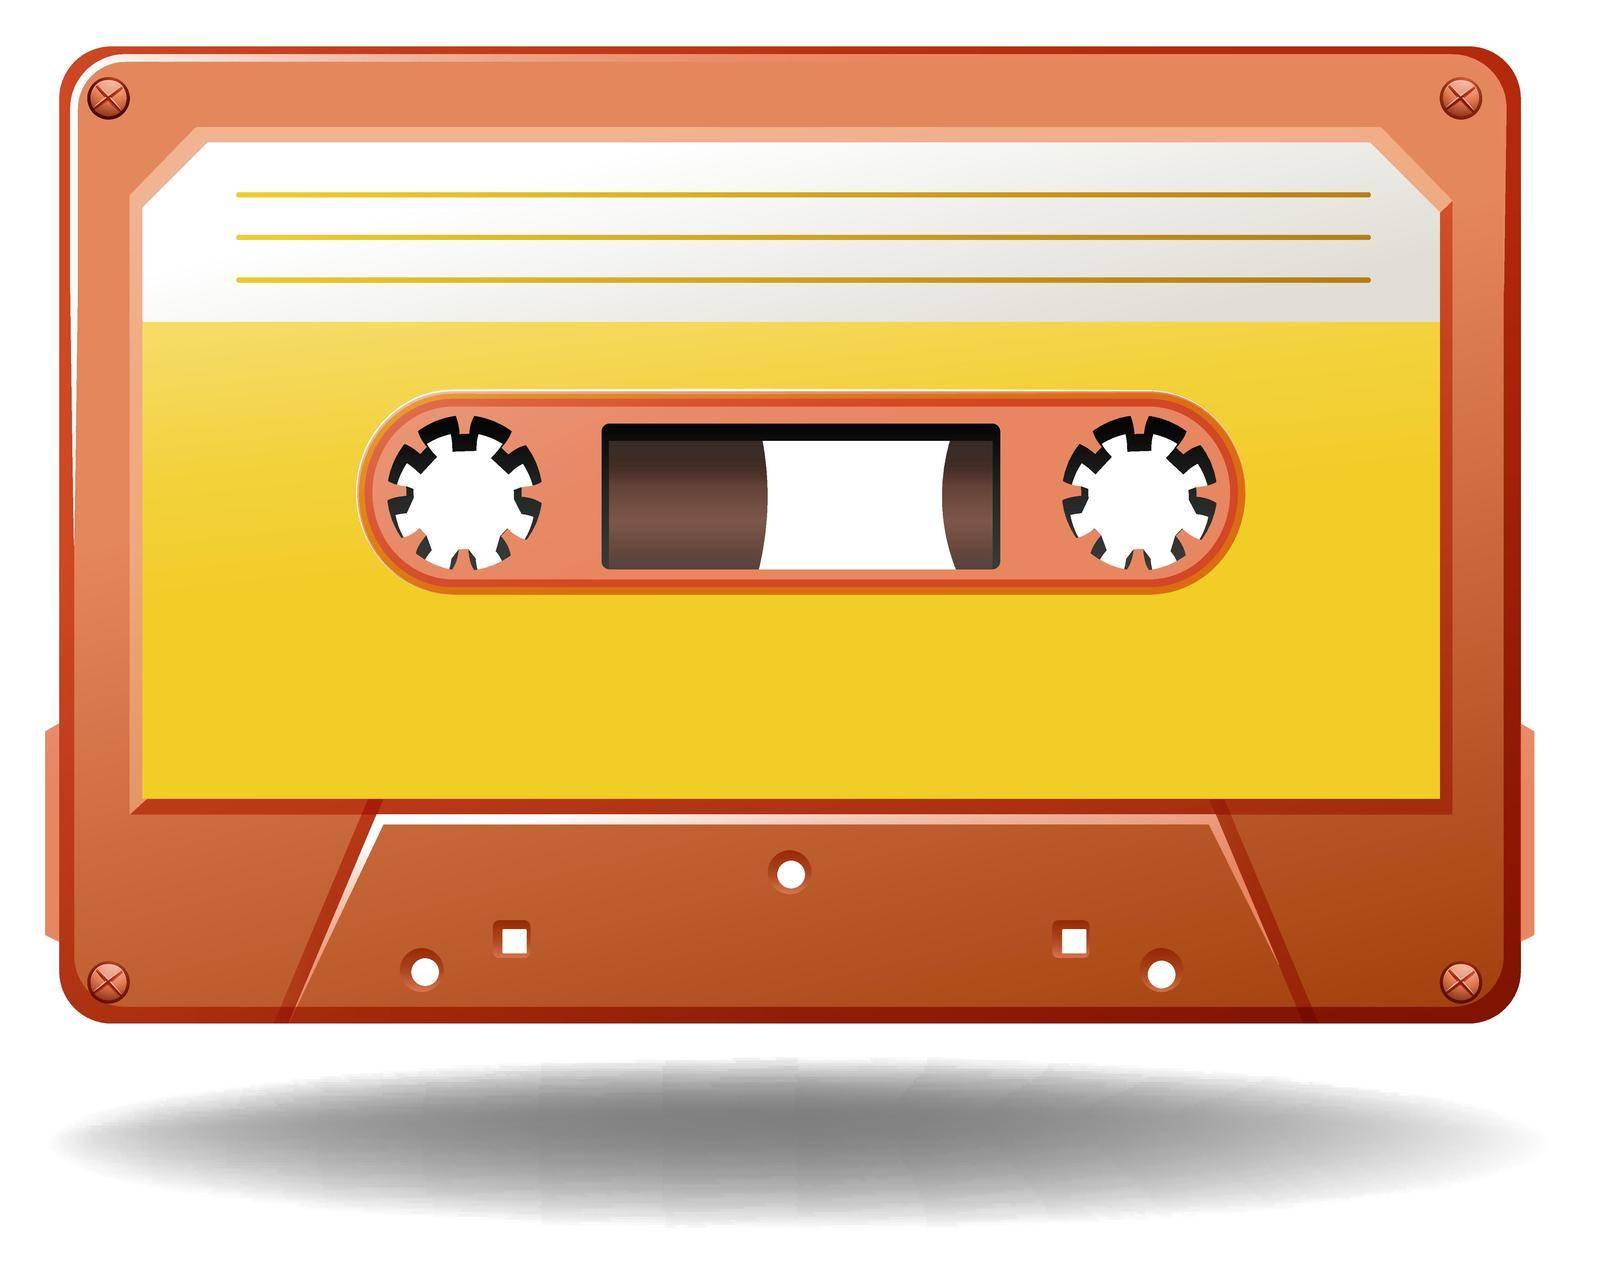 Single tape cassette in orange color